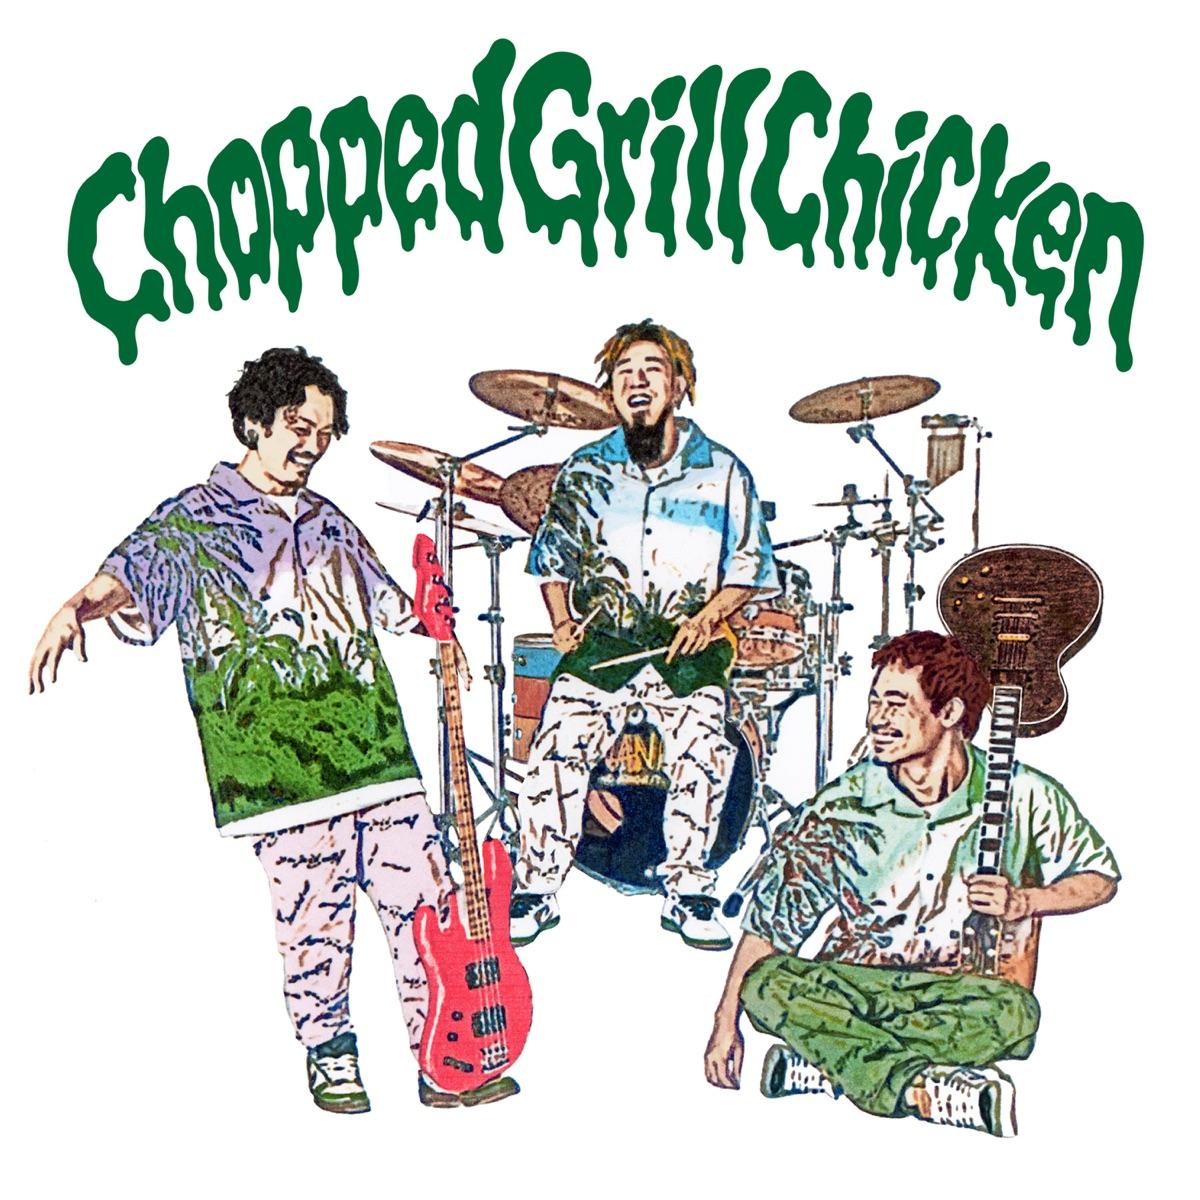 『WANIMA - Chopped Grill Chicken』収録の『Chopped Grill Chicken』ジャケット